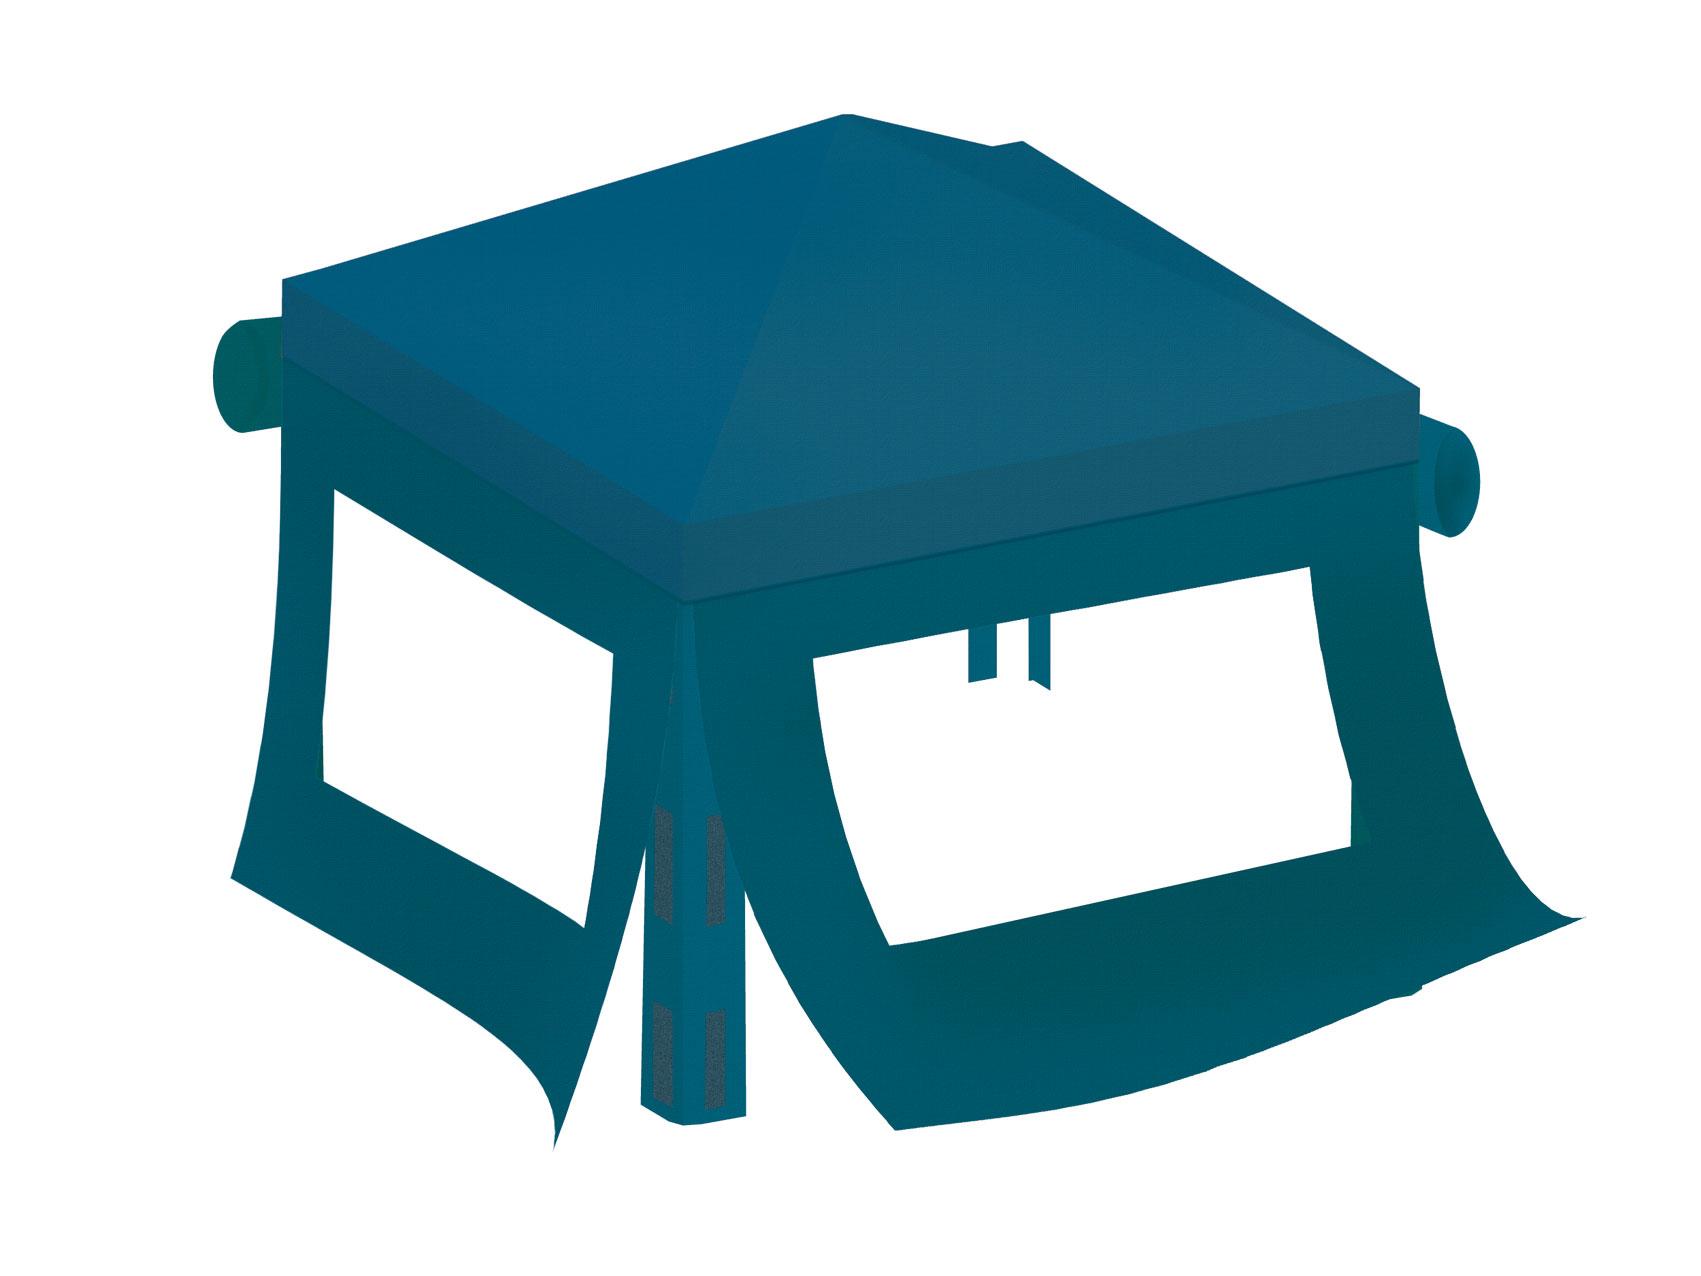 benjamin seitenteile und dach f r kinderpavillon benjamin blau bei. Black Bedroom Furniture Sets. Home Design Ideas